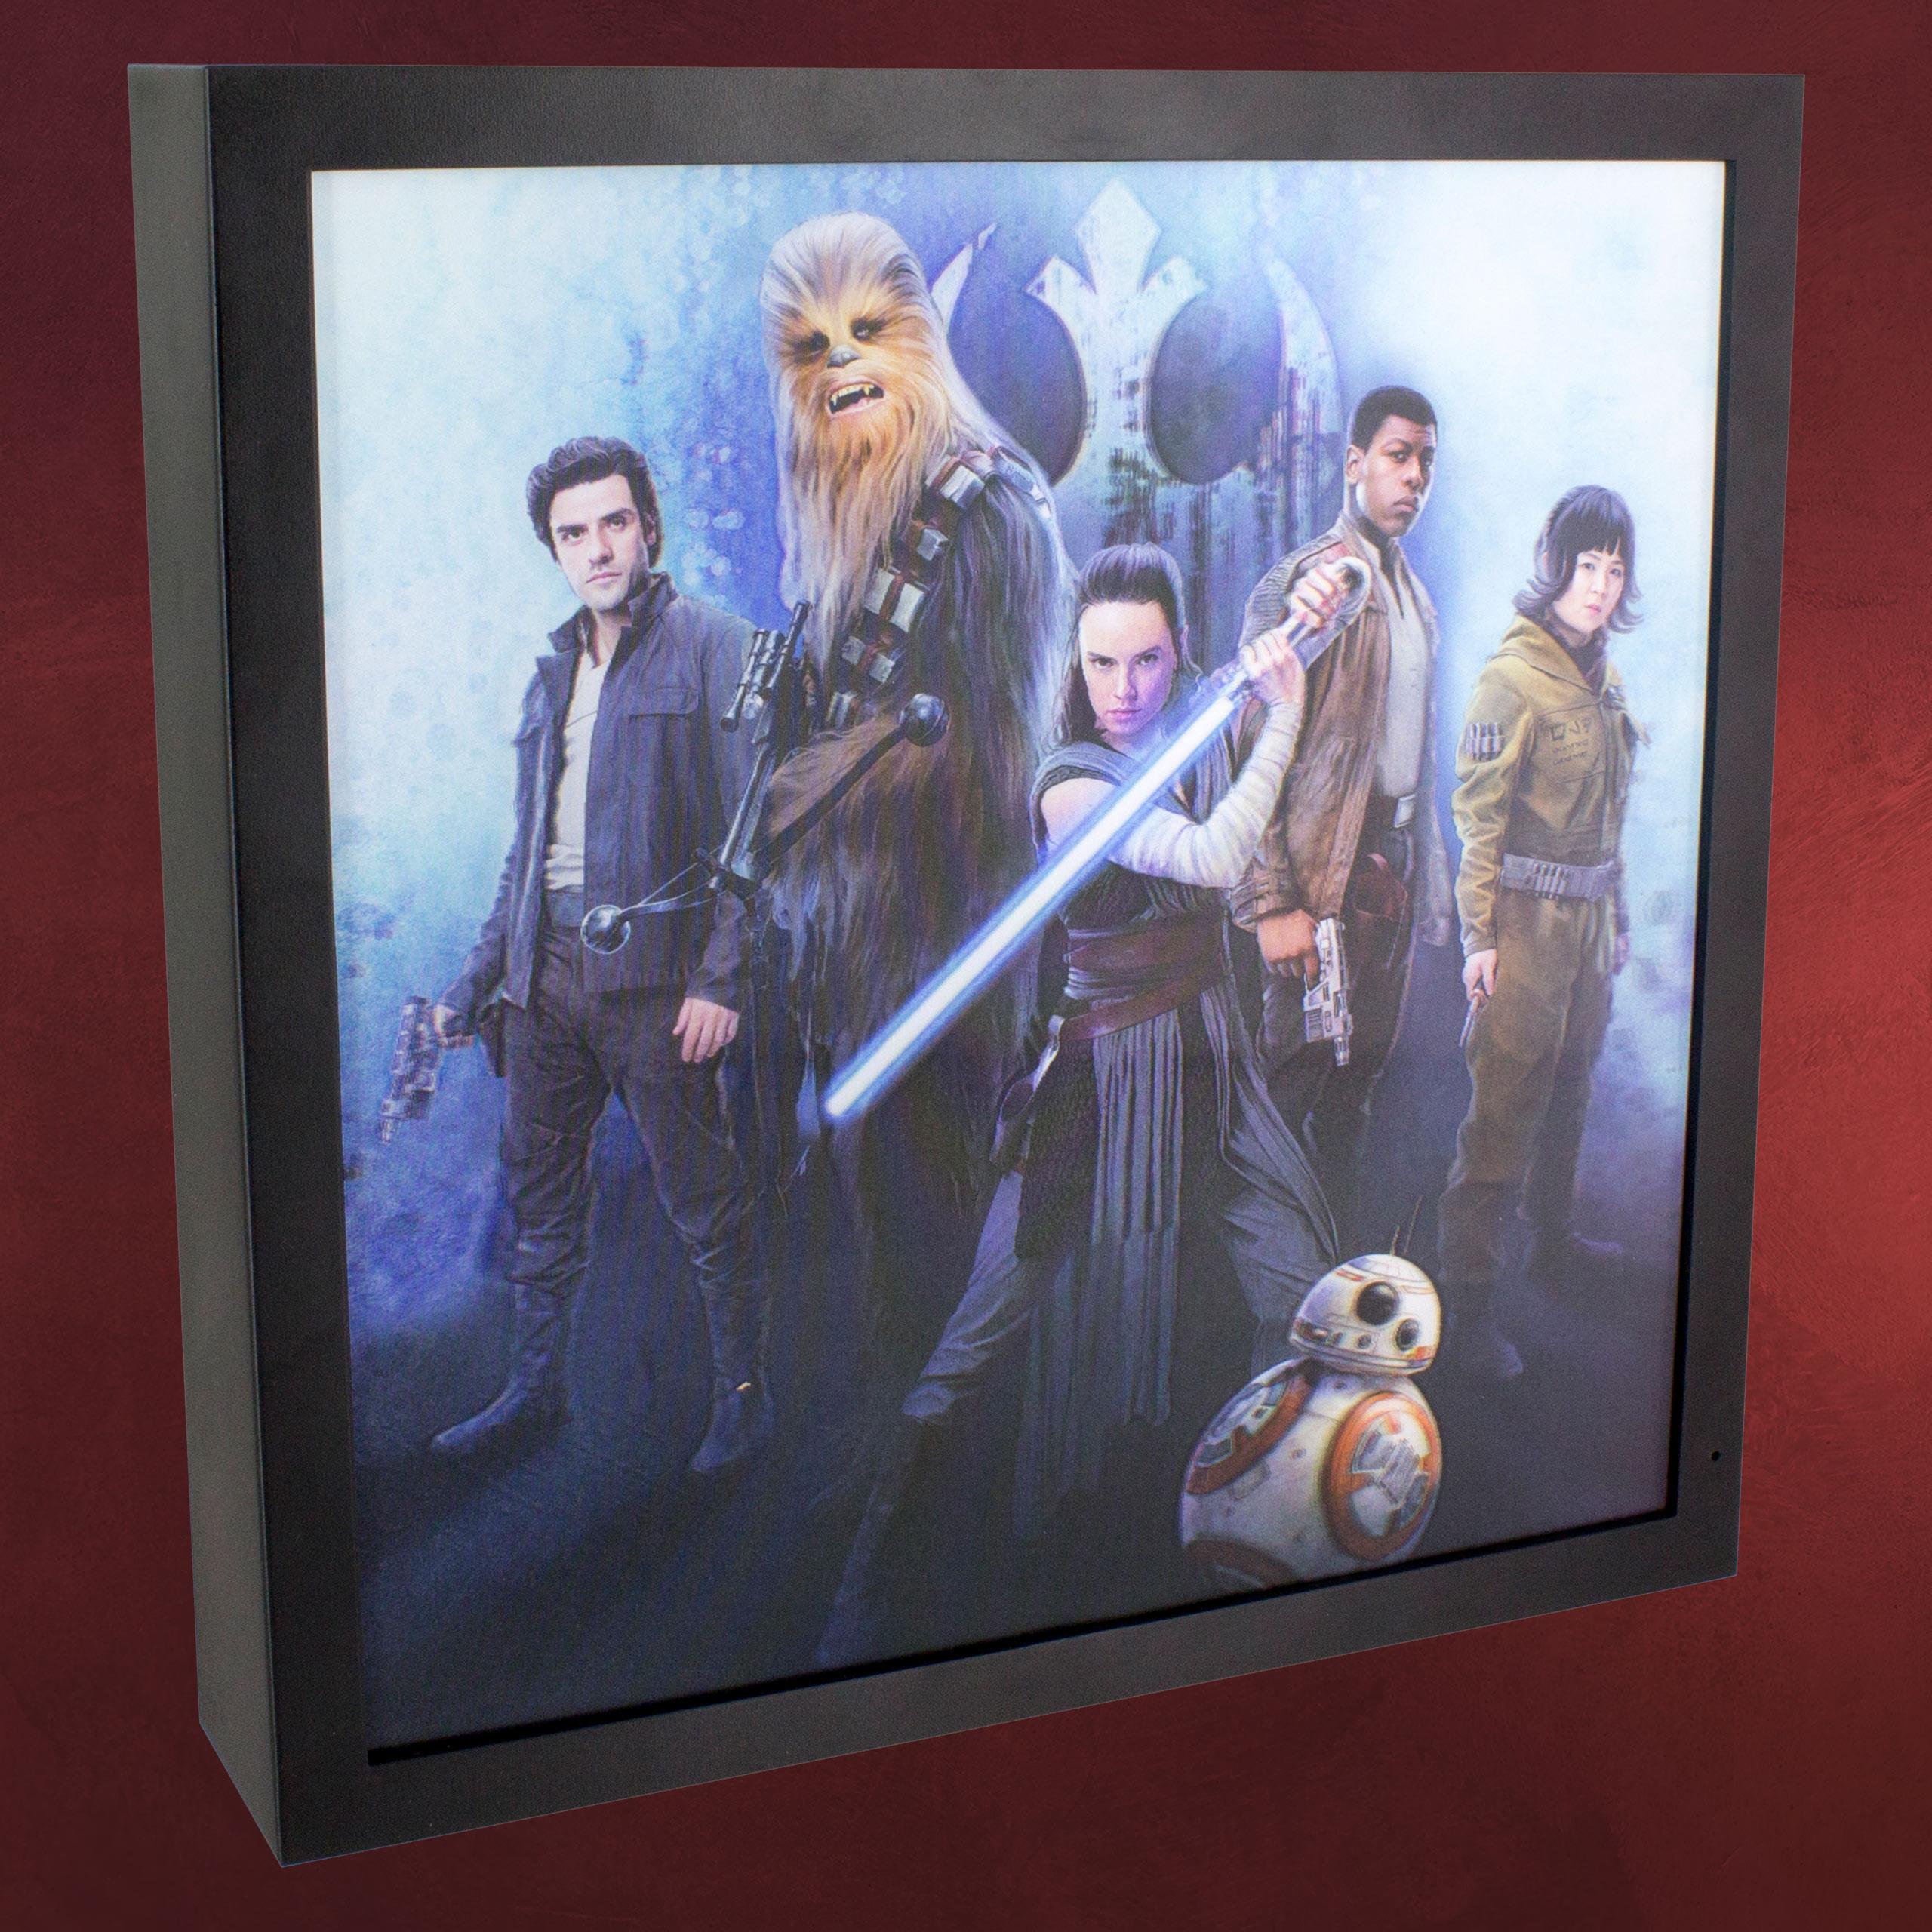 star wars characters wandbild mit licht elbenwald. Black Bedroom Furniture Sets. Home Design Ideas